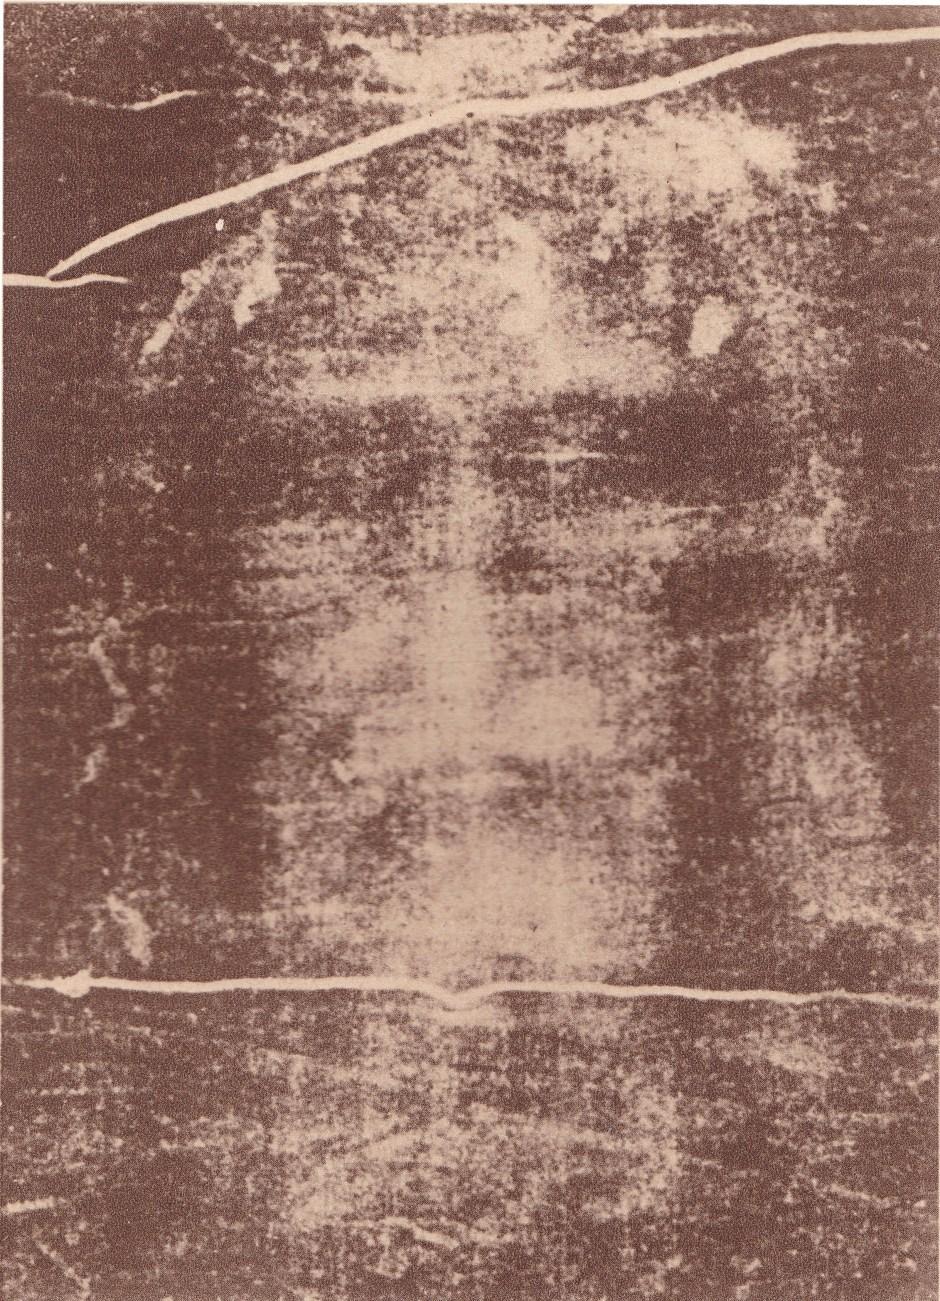 1898-Secondo-Pia-NdM-neg